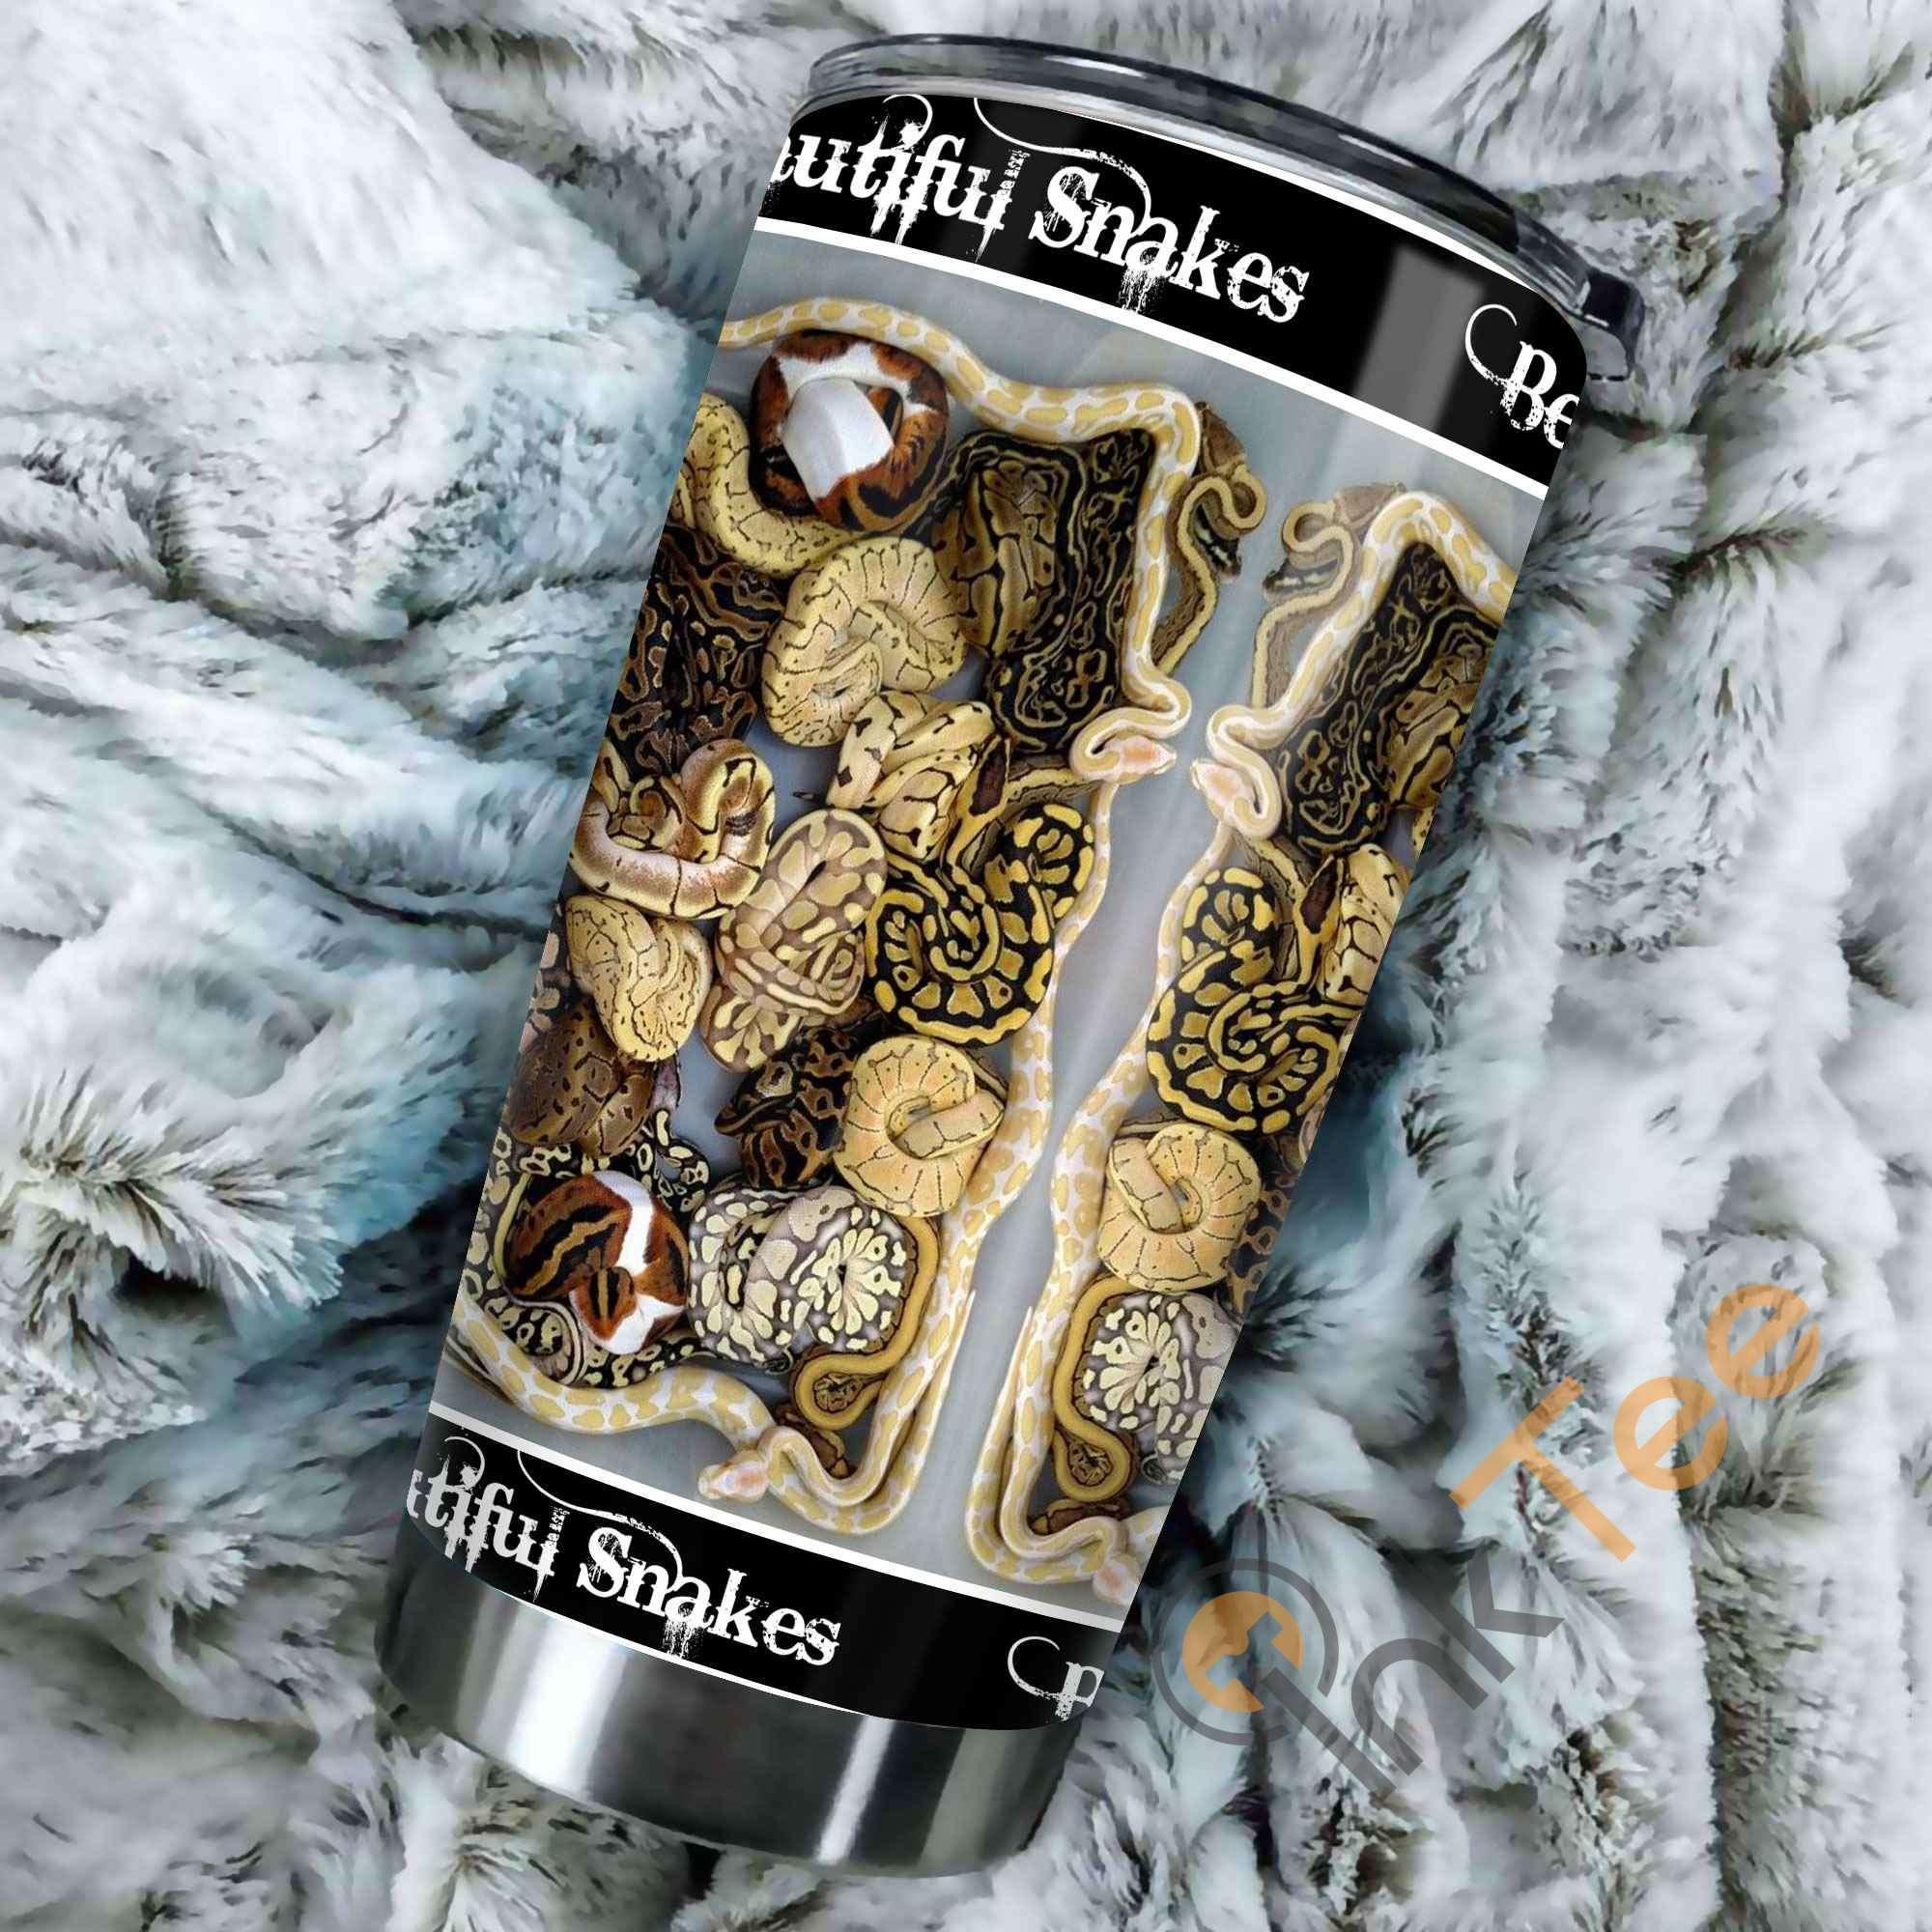 Beautiful Snakes Amazon Best Seller Sku 3603 Stainless Steel Tumbler